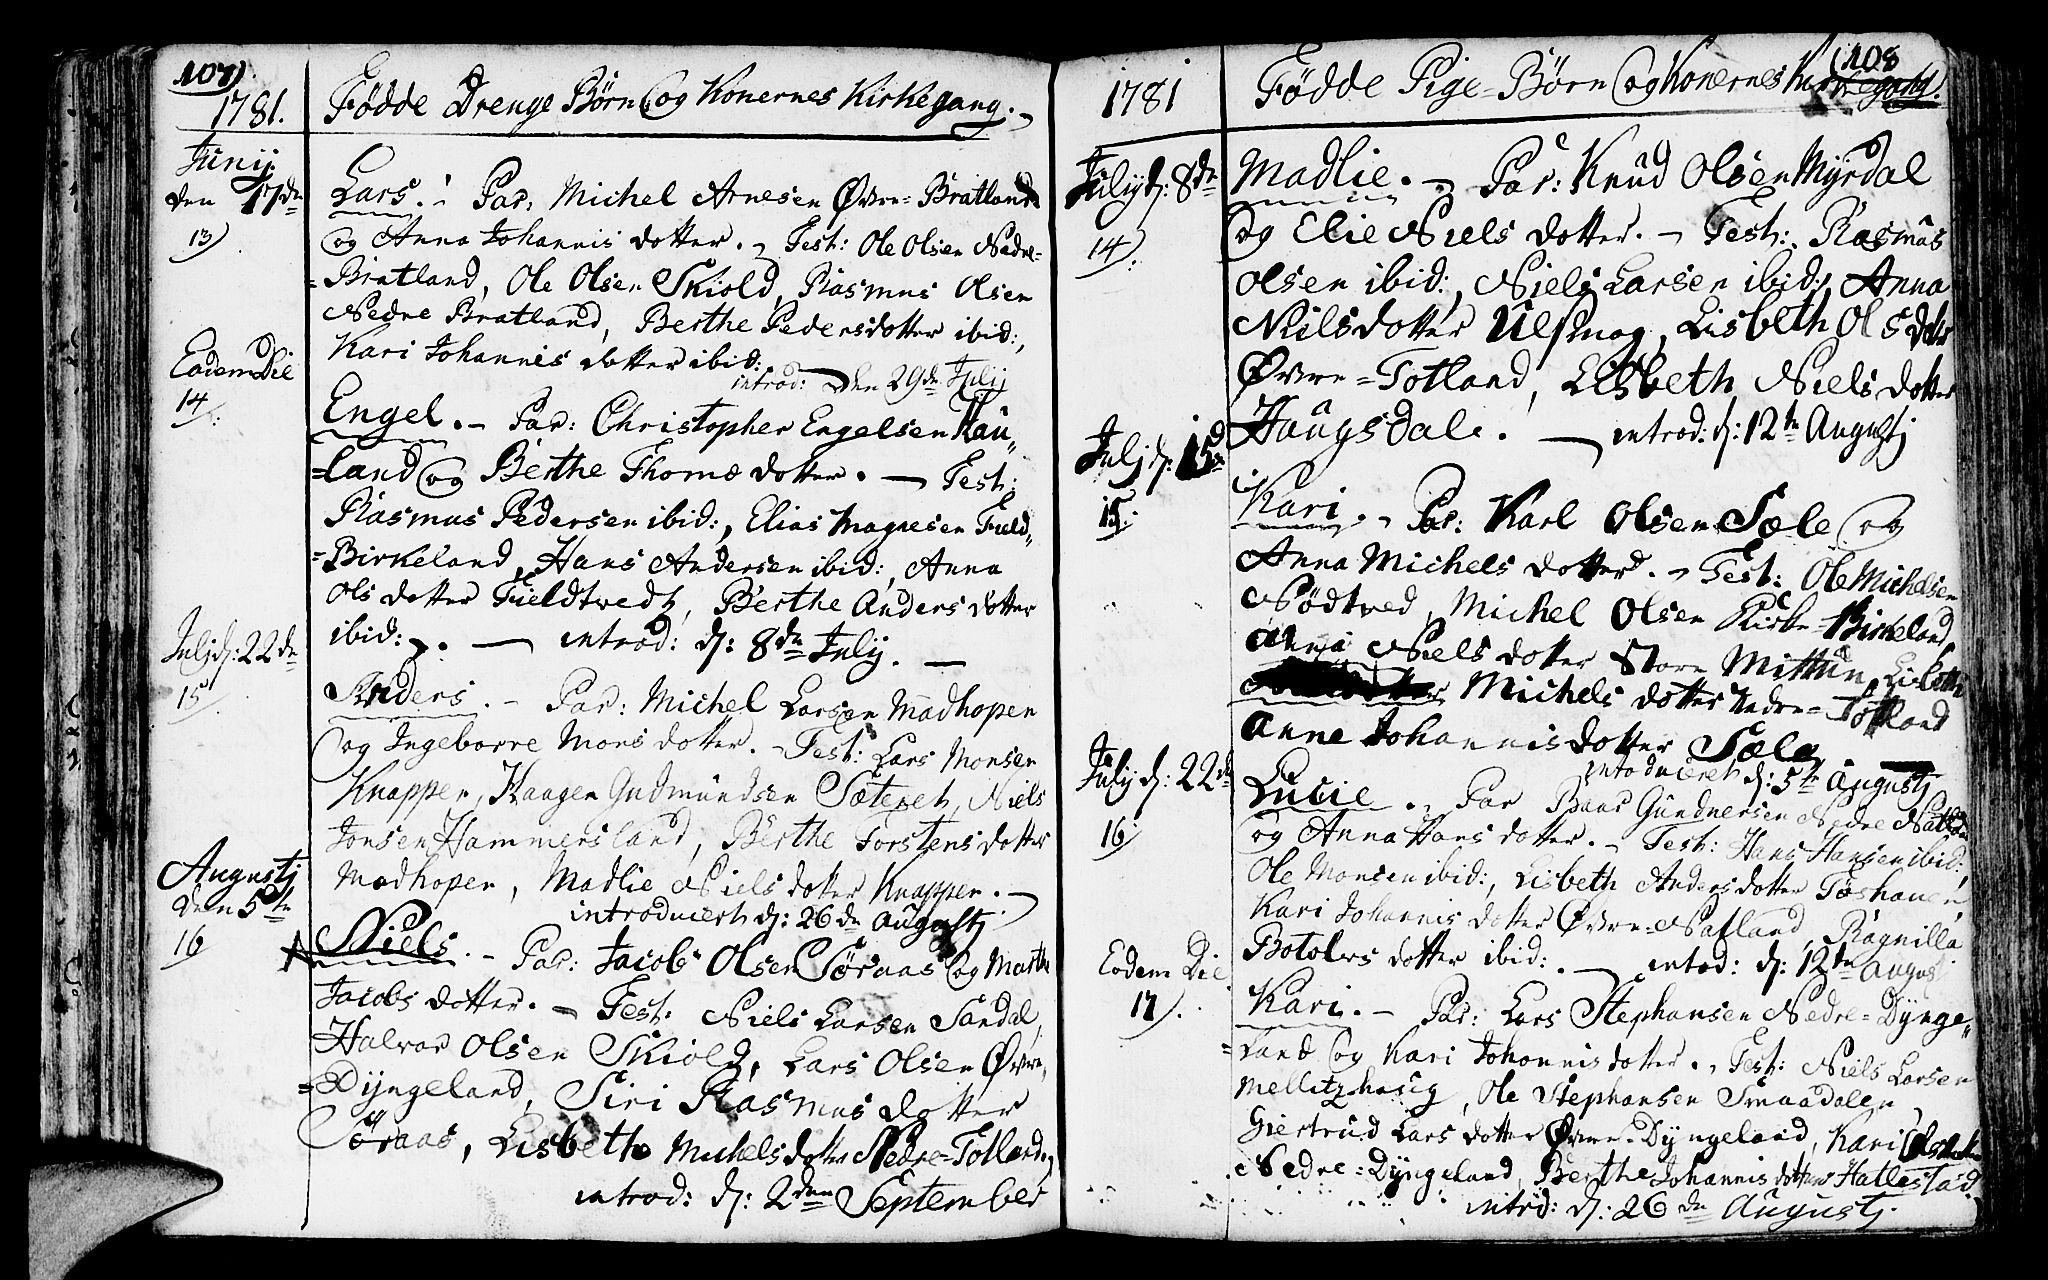 SAB, Fana Sokneprestembete, H/Haa/Haaa/L0005: Ministerialbok nr. A 5, 1773-1799, s. 107-108